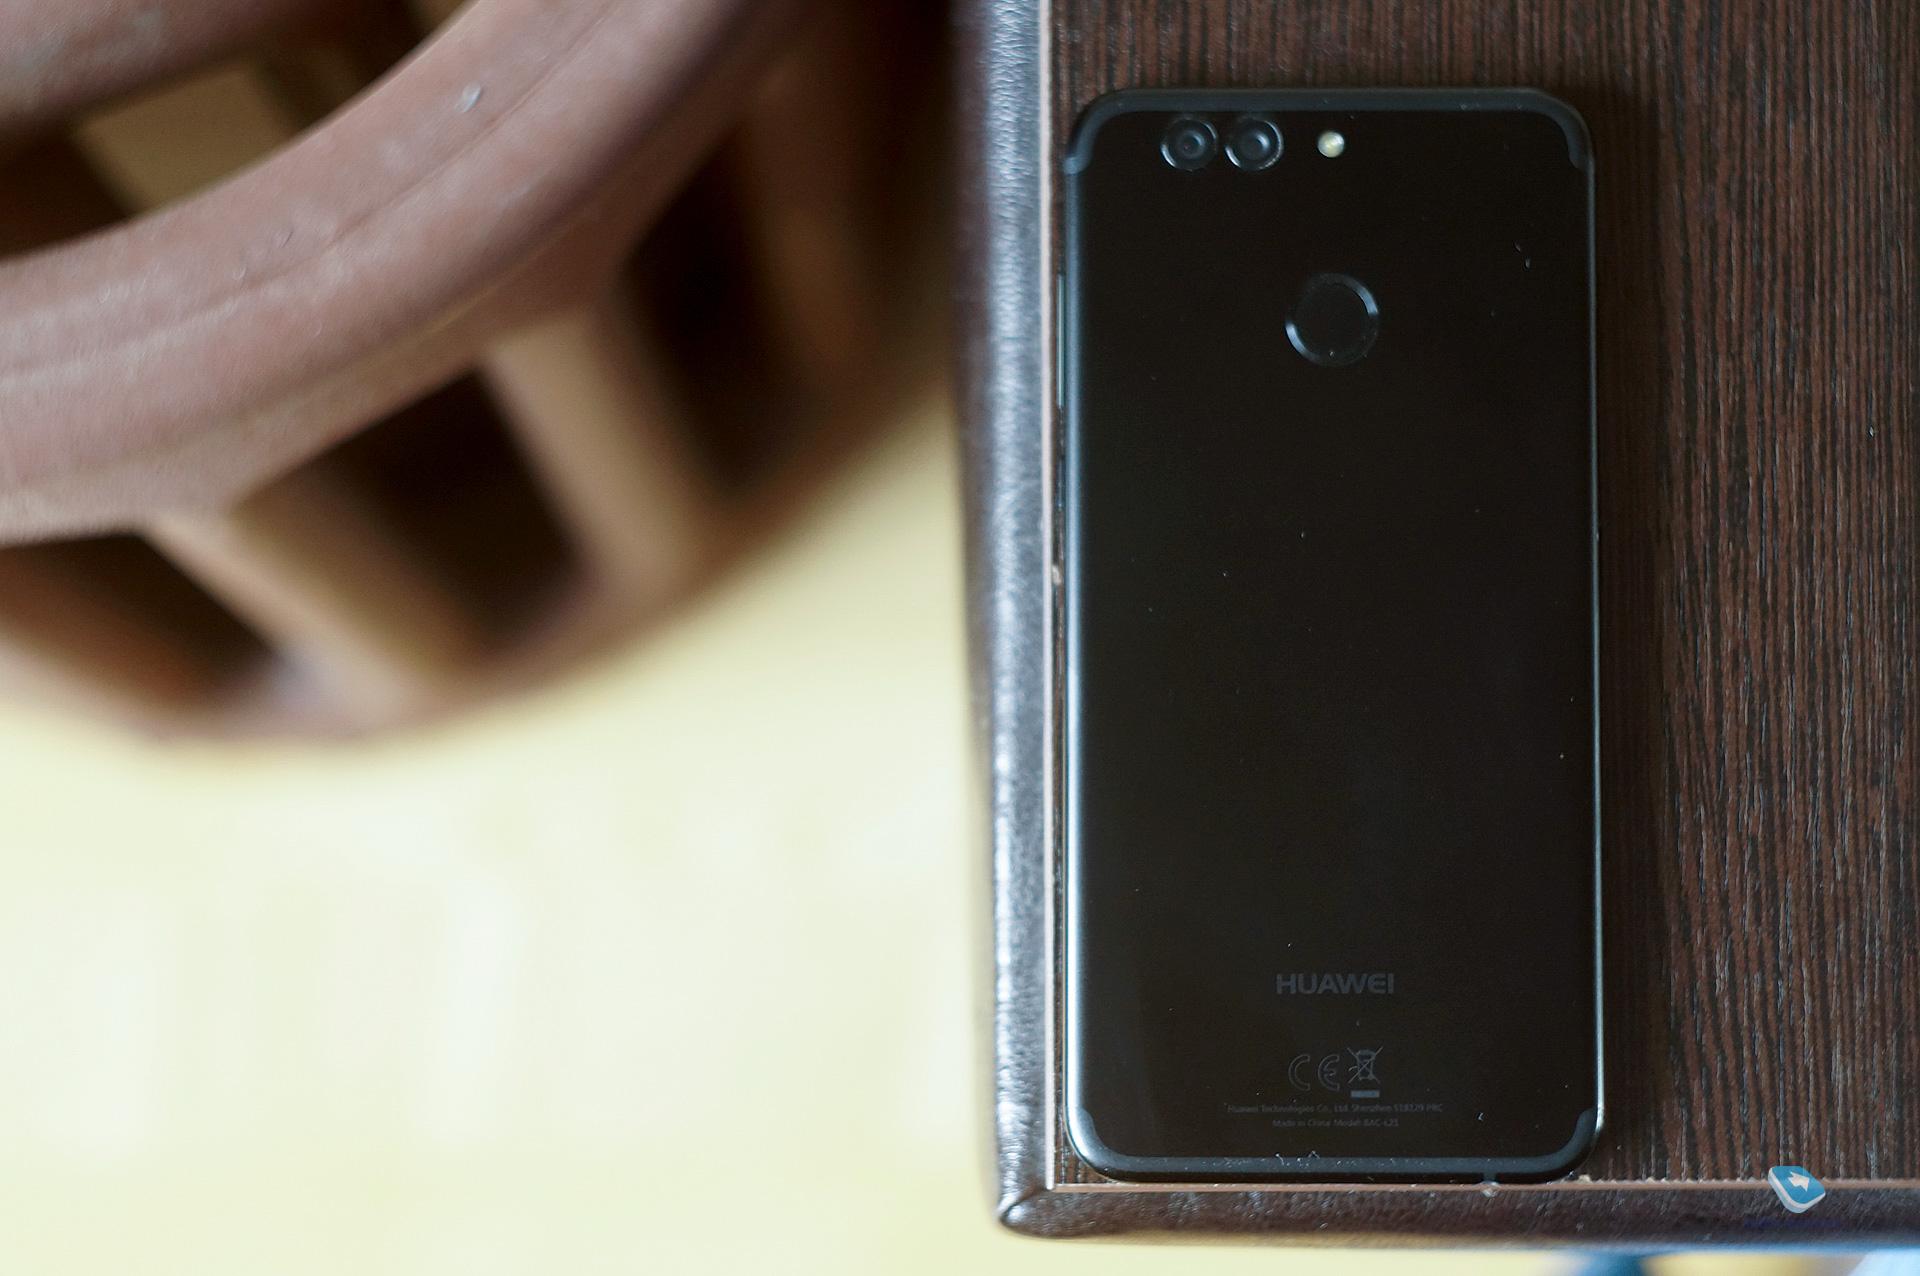 Mobile-review com Обзор смартфона Huawei Nova 2 Plus (BAC-L21)